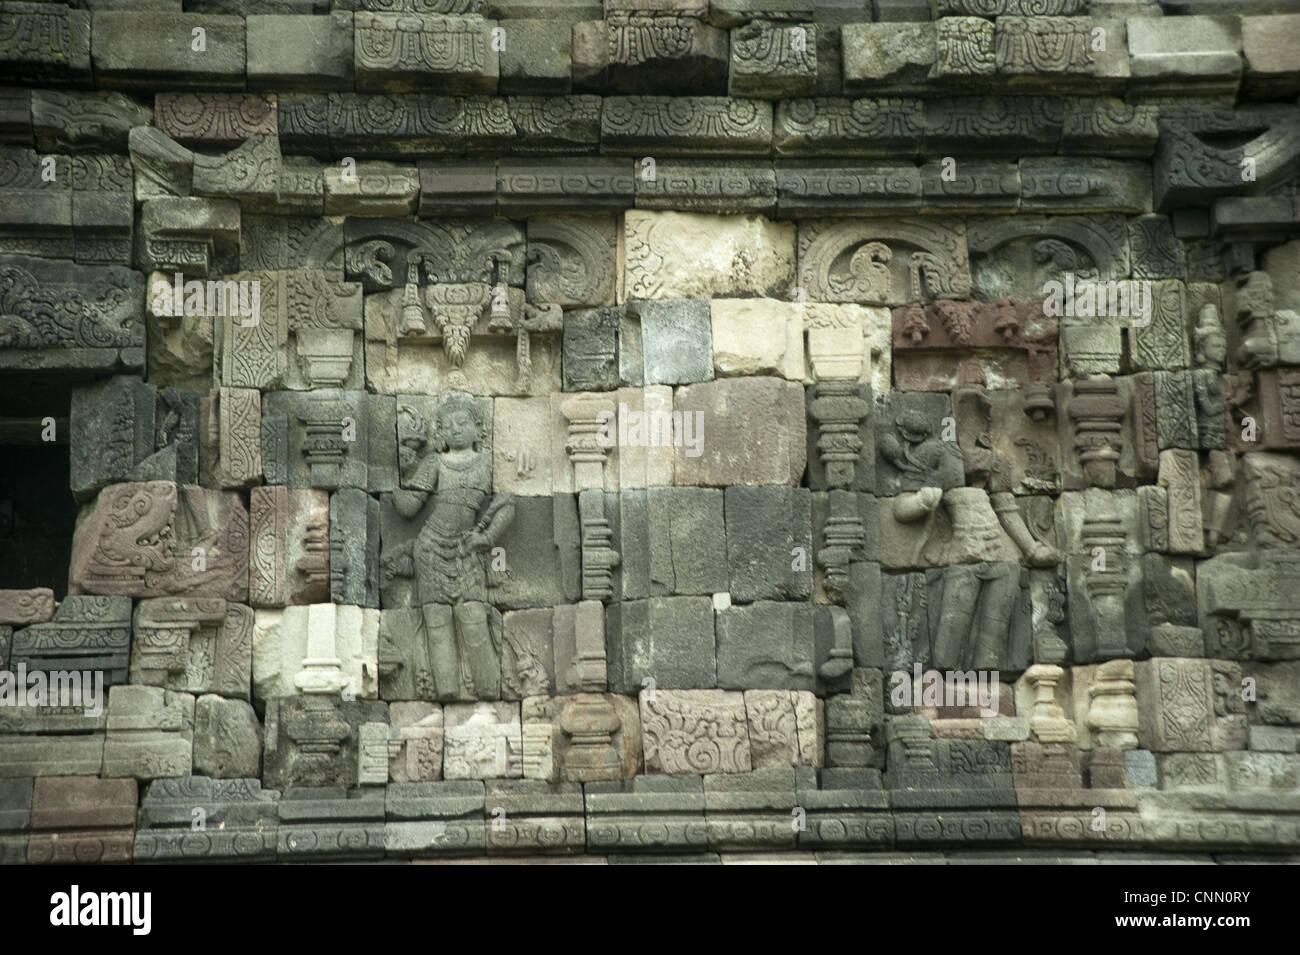 Reliefs on Buddhist temple walls, Plaosan Lor, Candi Plaosan, Prambanan District, Central Java, Indonesia - Stock Image